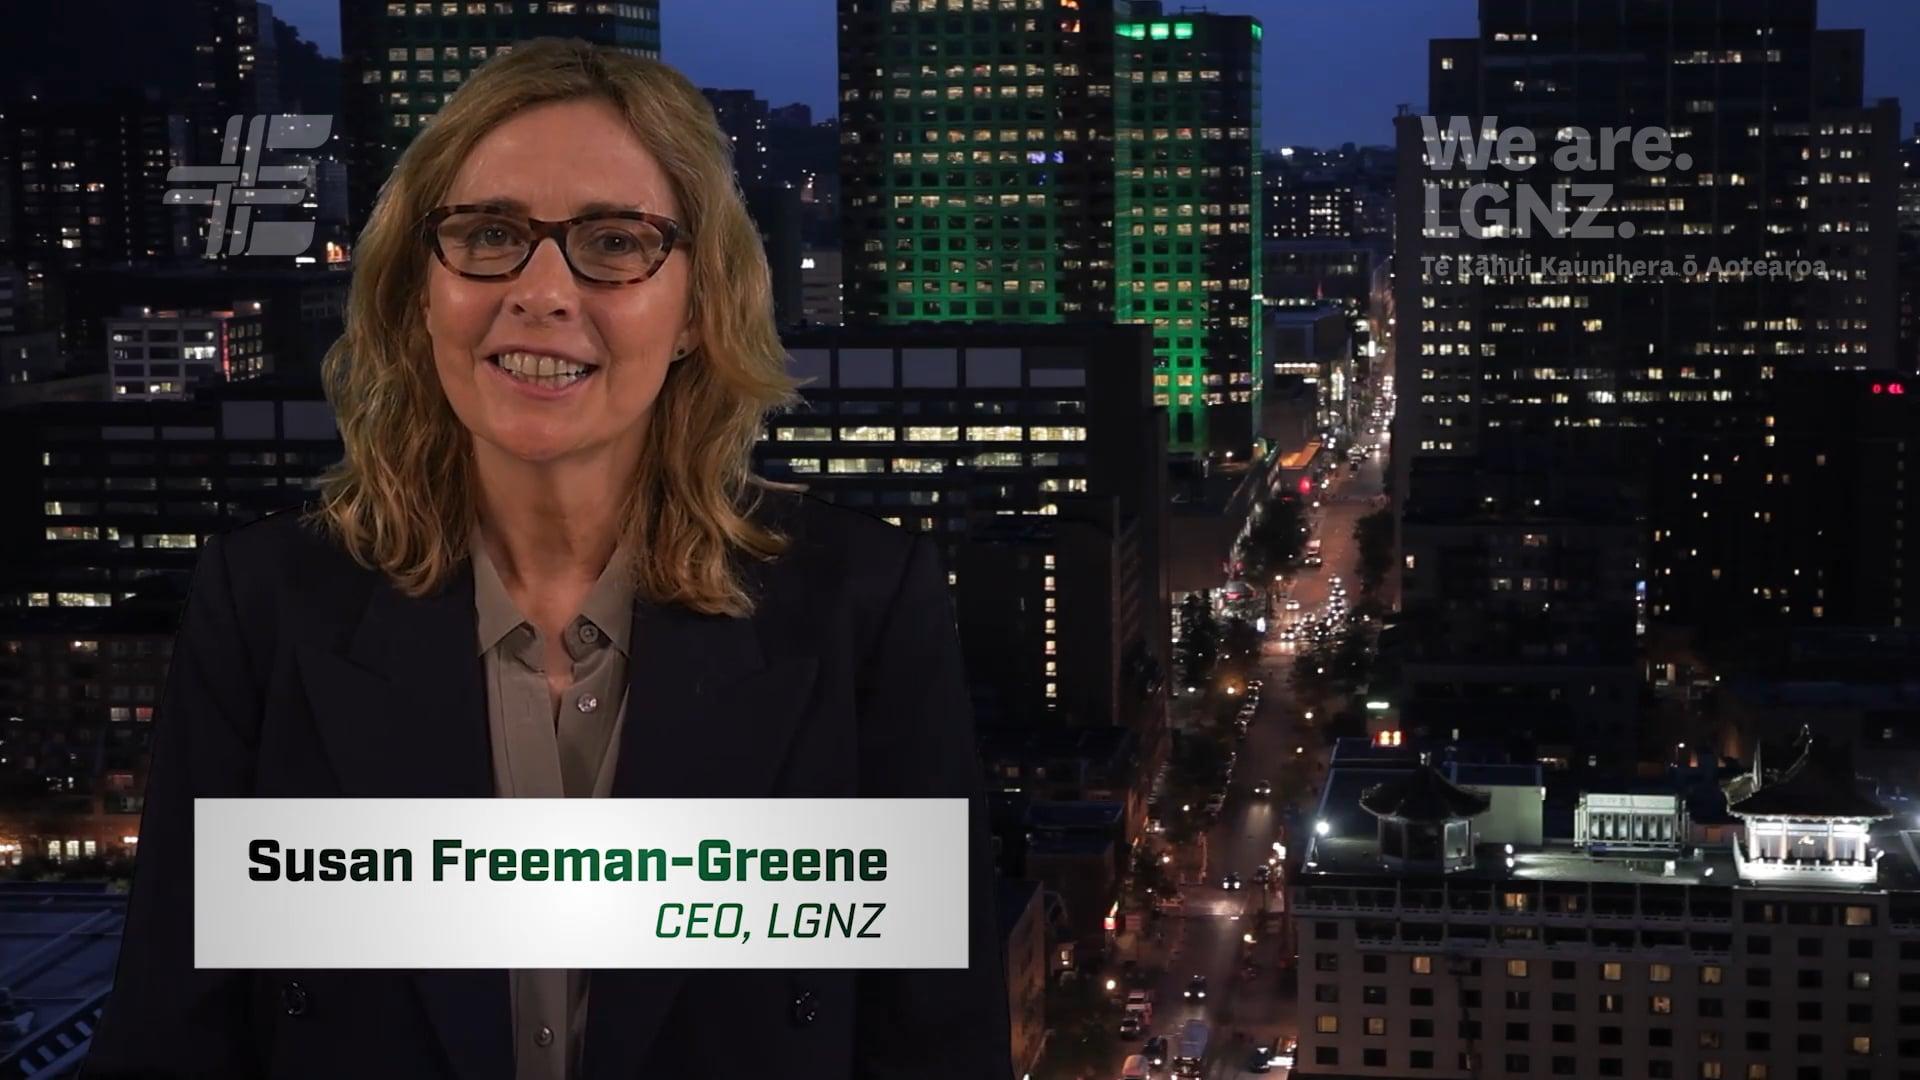 Susan Freeman-Greene, CEO, LGNZ